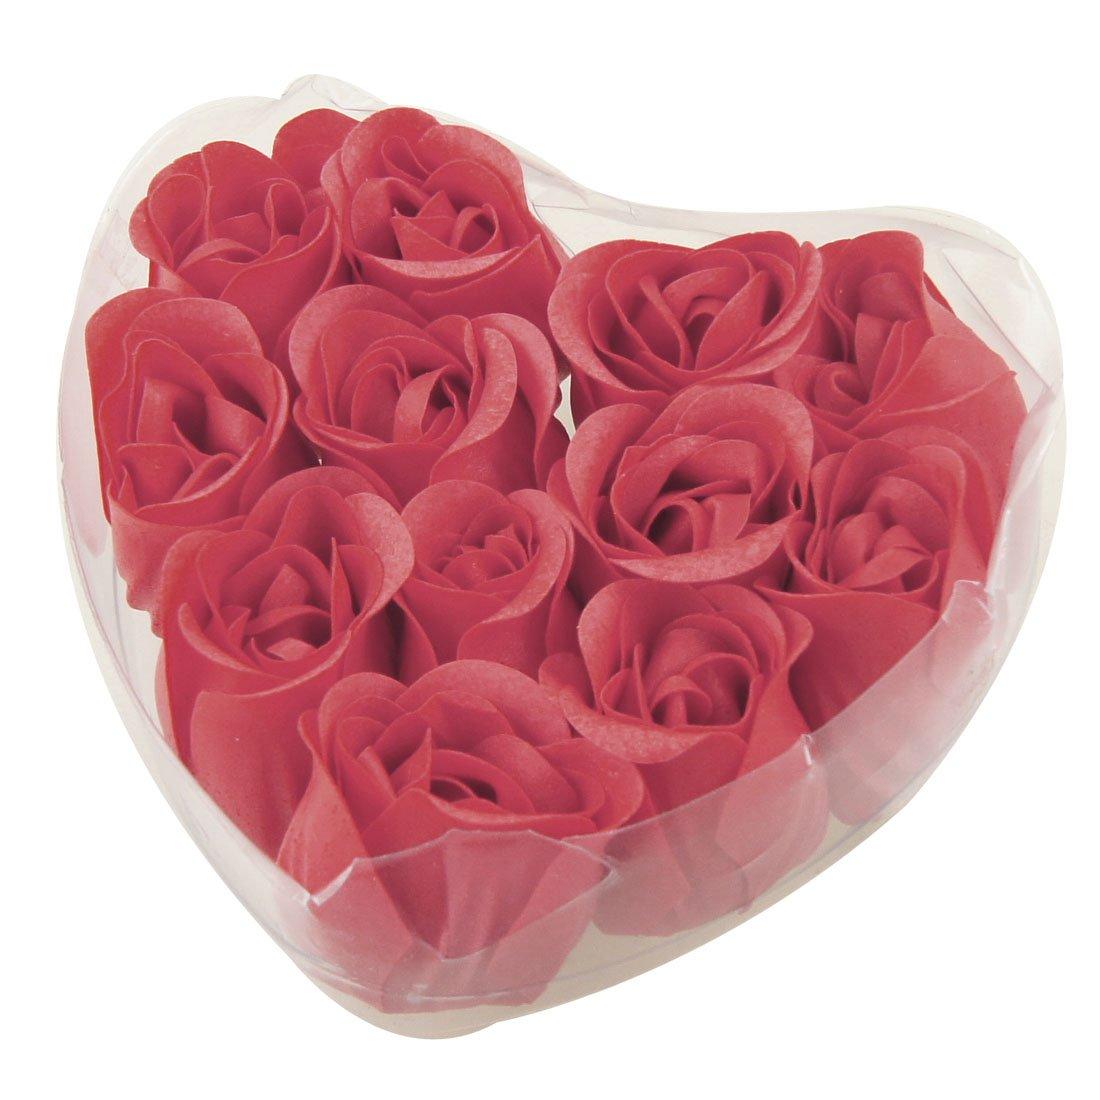 New 12 Pcs Red Fragrant Rose Bud Petal Soap Wedding Favor + Heart Shape Box